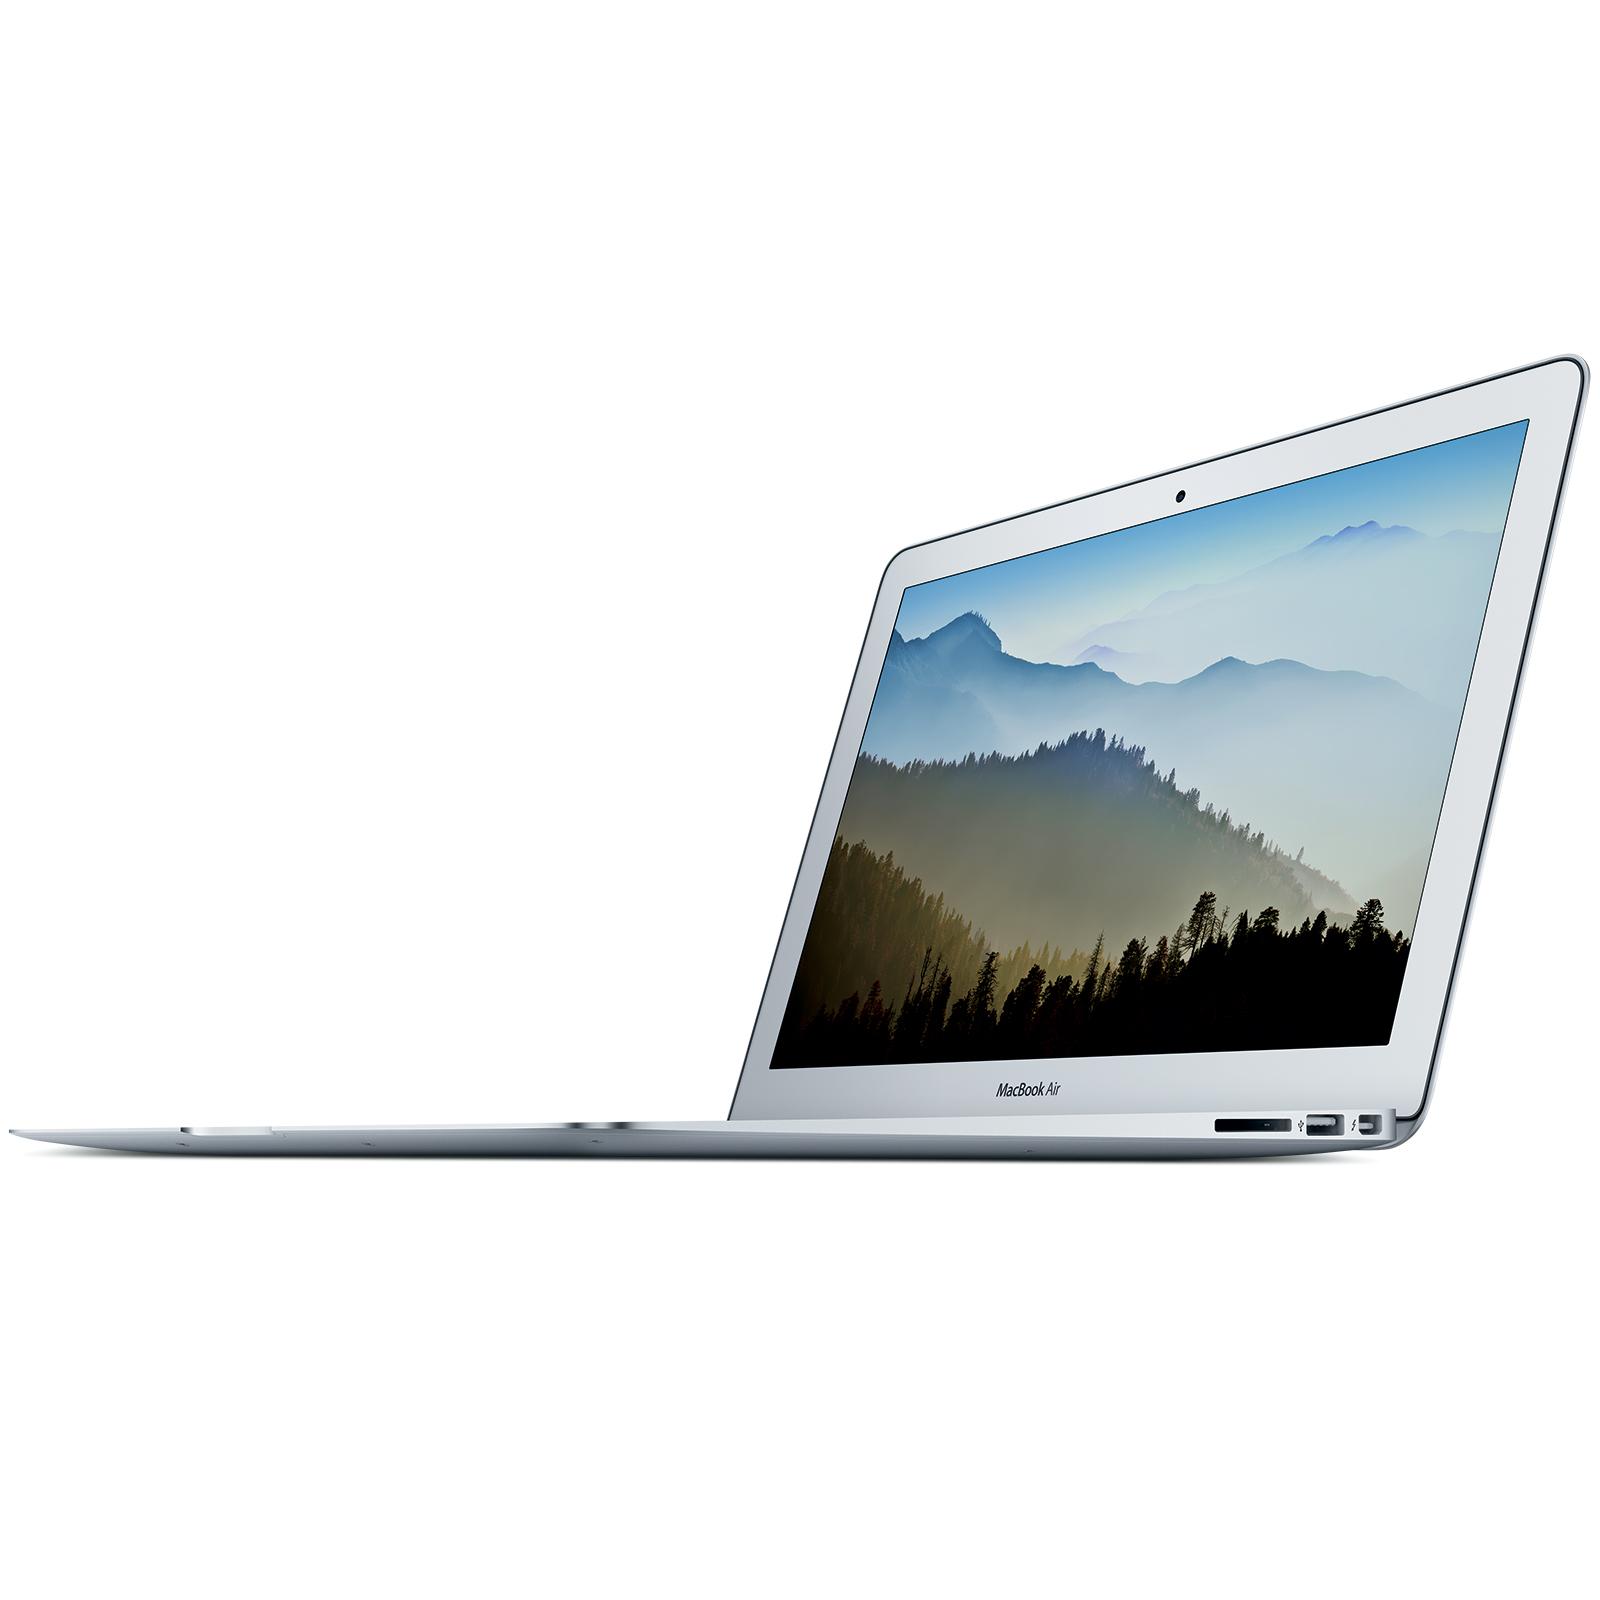 apple macbook air 13 mqd32fn a macbook apple sur. Black Bedroom Furniture Sets. Home Design Ideas